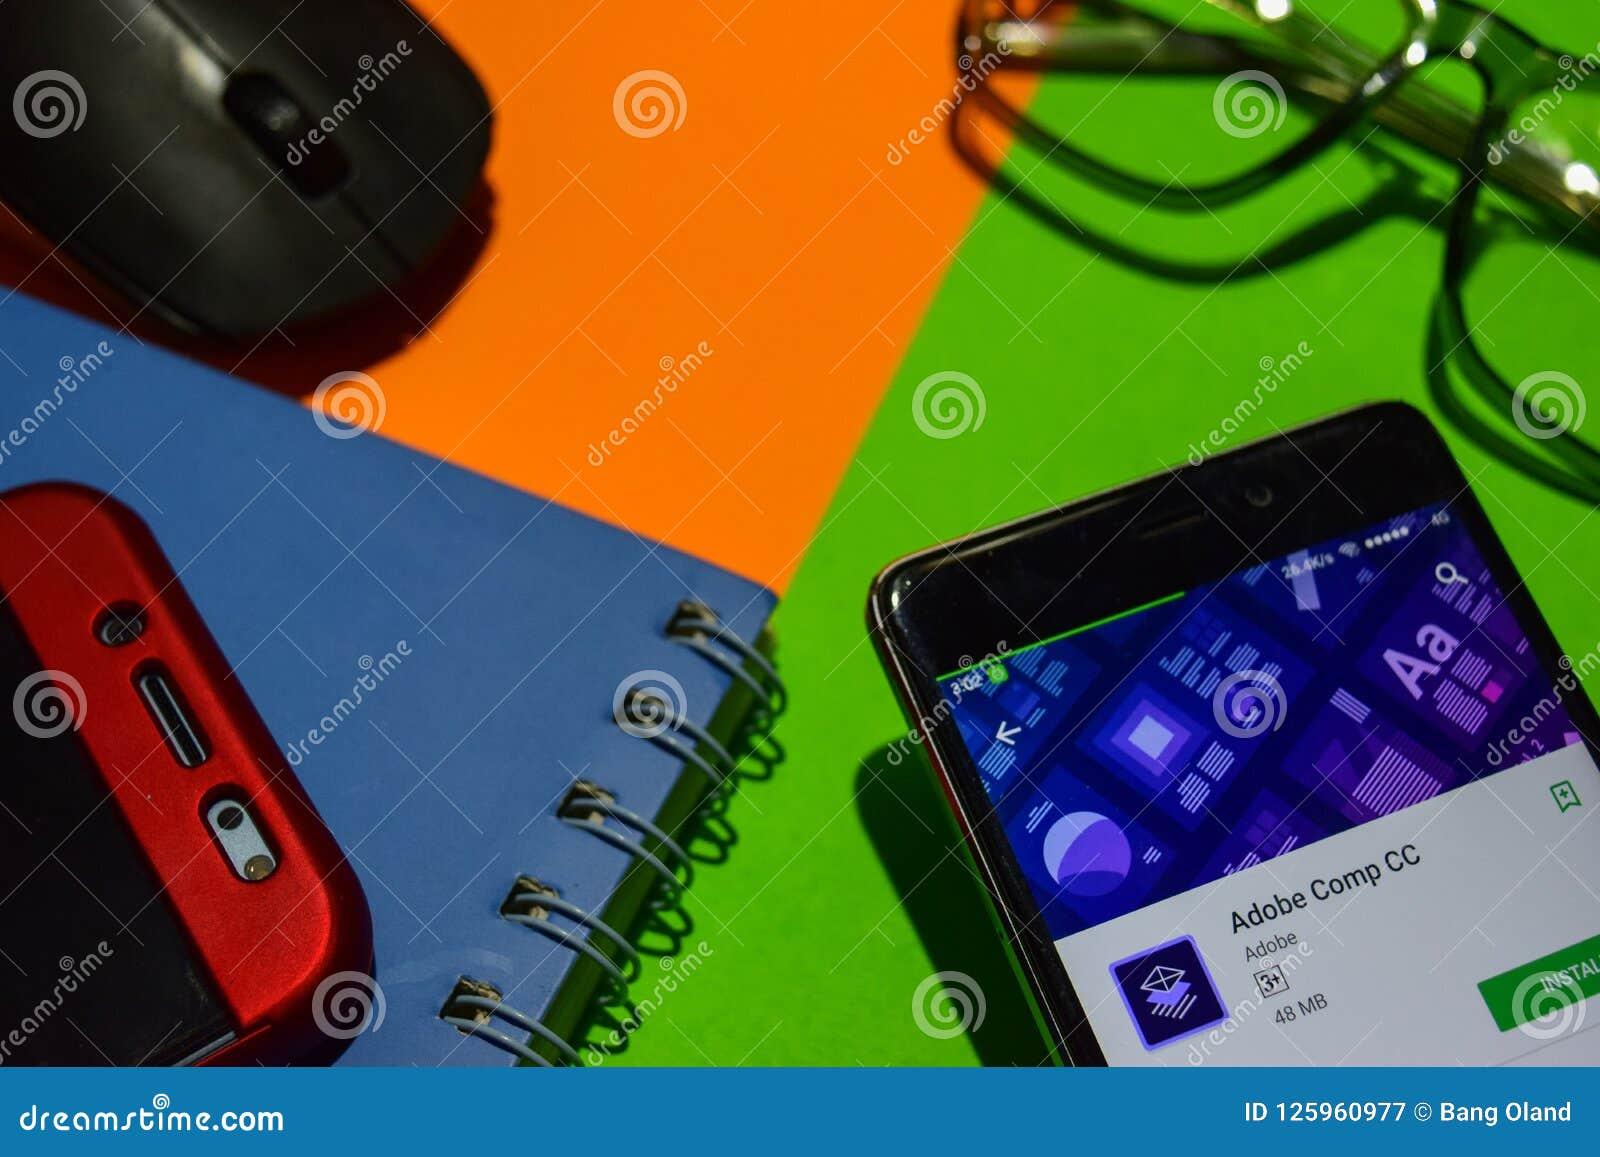 Adobe在智能手机屏幕上的Comp CC dev app